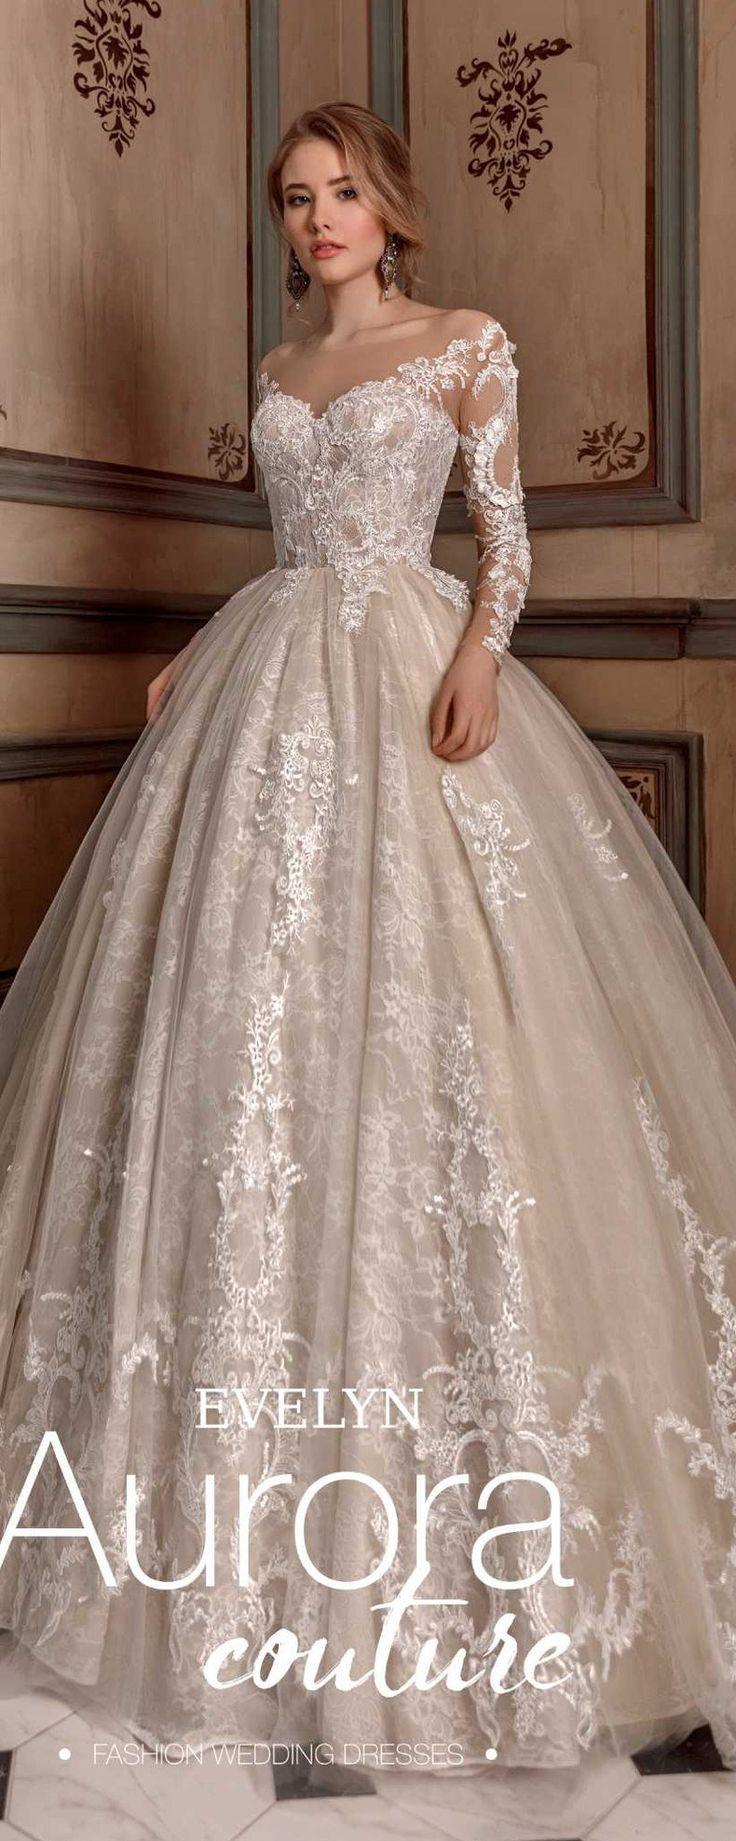 Ball gowns wedding dresses  Ball gown wedding dress EVELYN wedding dresses bridal dress